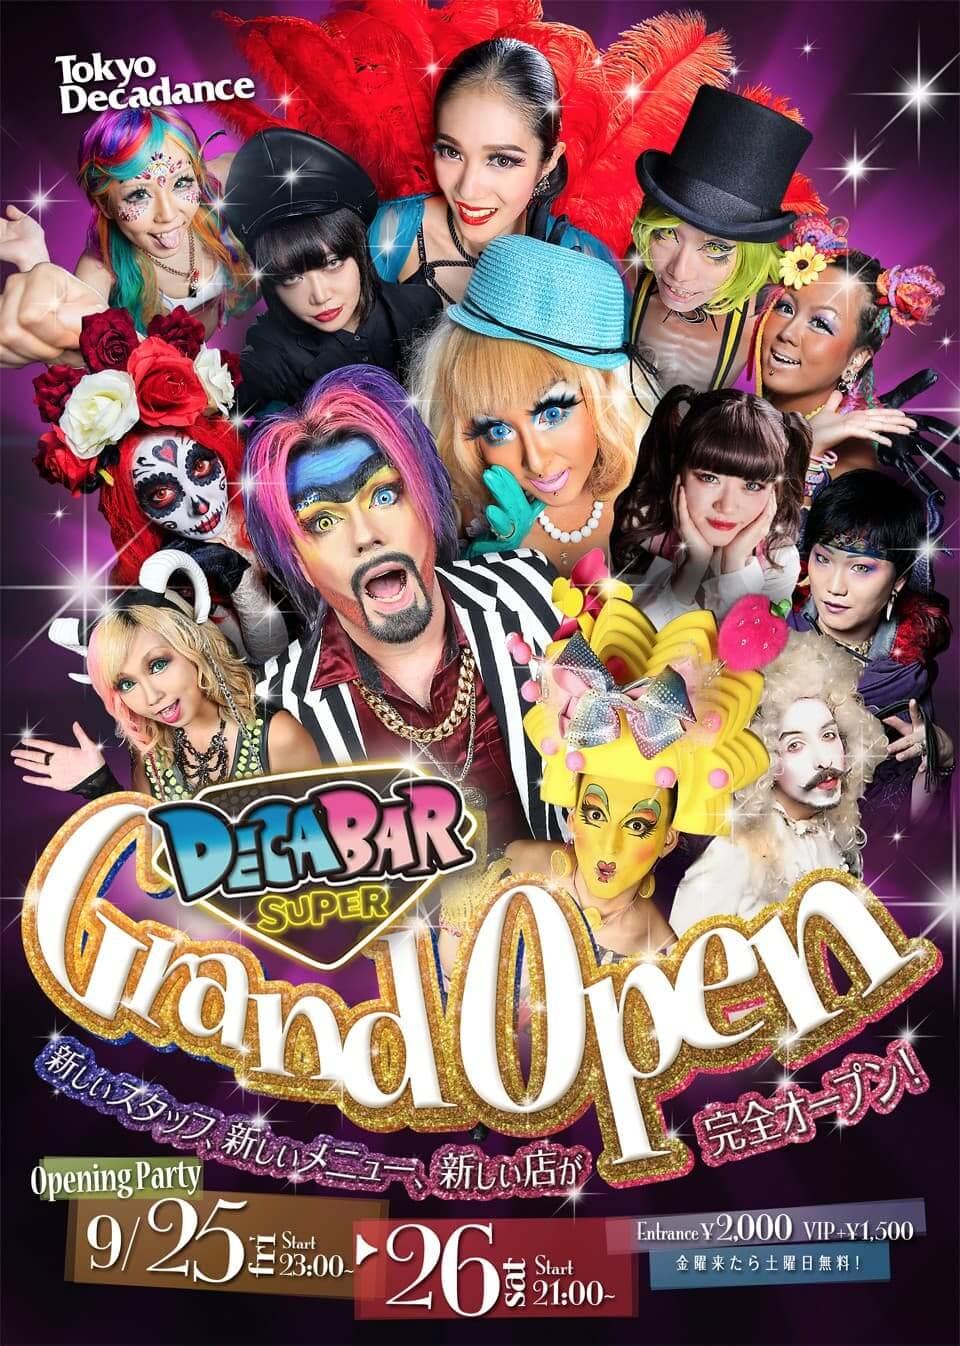 Mistress Amrita Singing and bondage/SM show   at DECABAR SUPER GRAND OPEN  in Tokyo, Japan on 26 September 2020